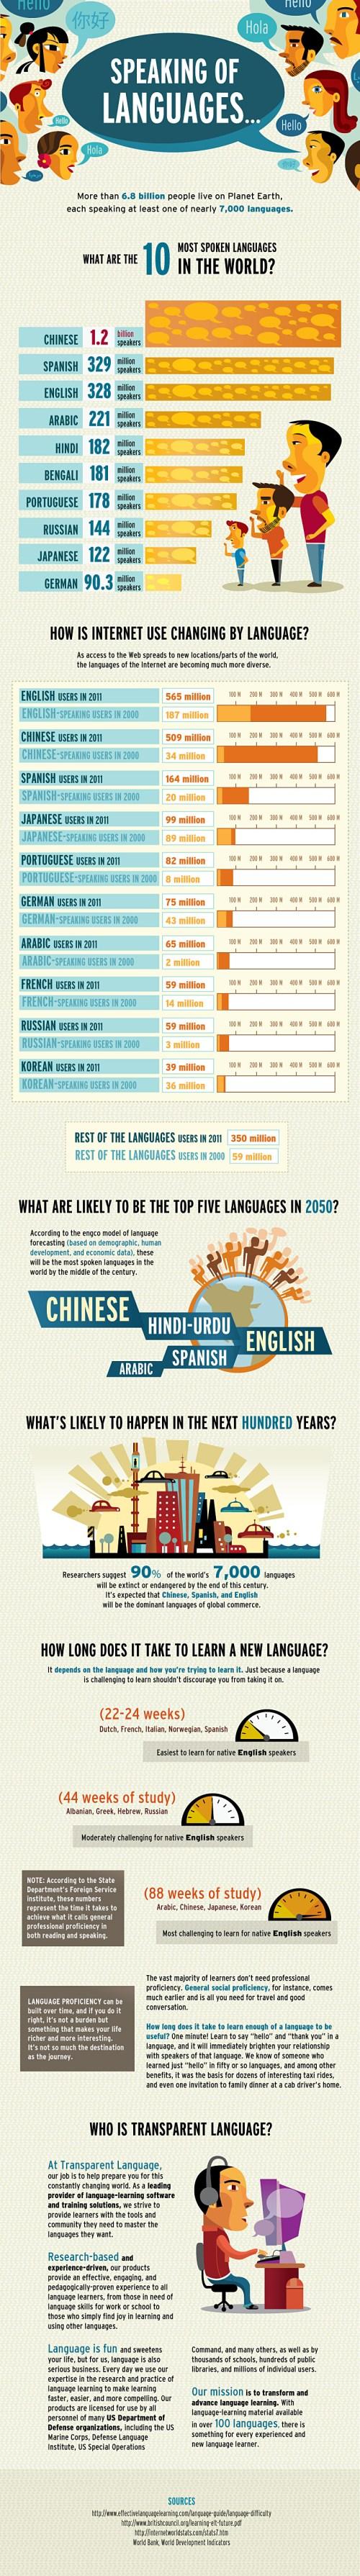 Speaking of Languages - Infographic